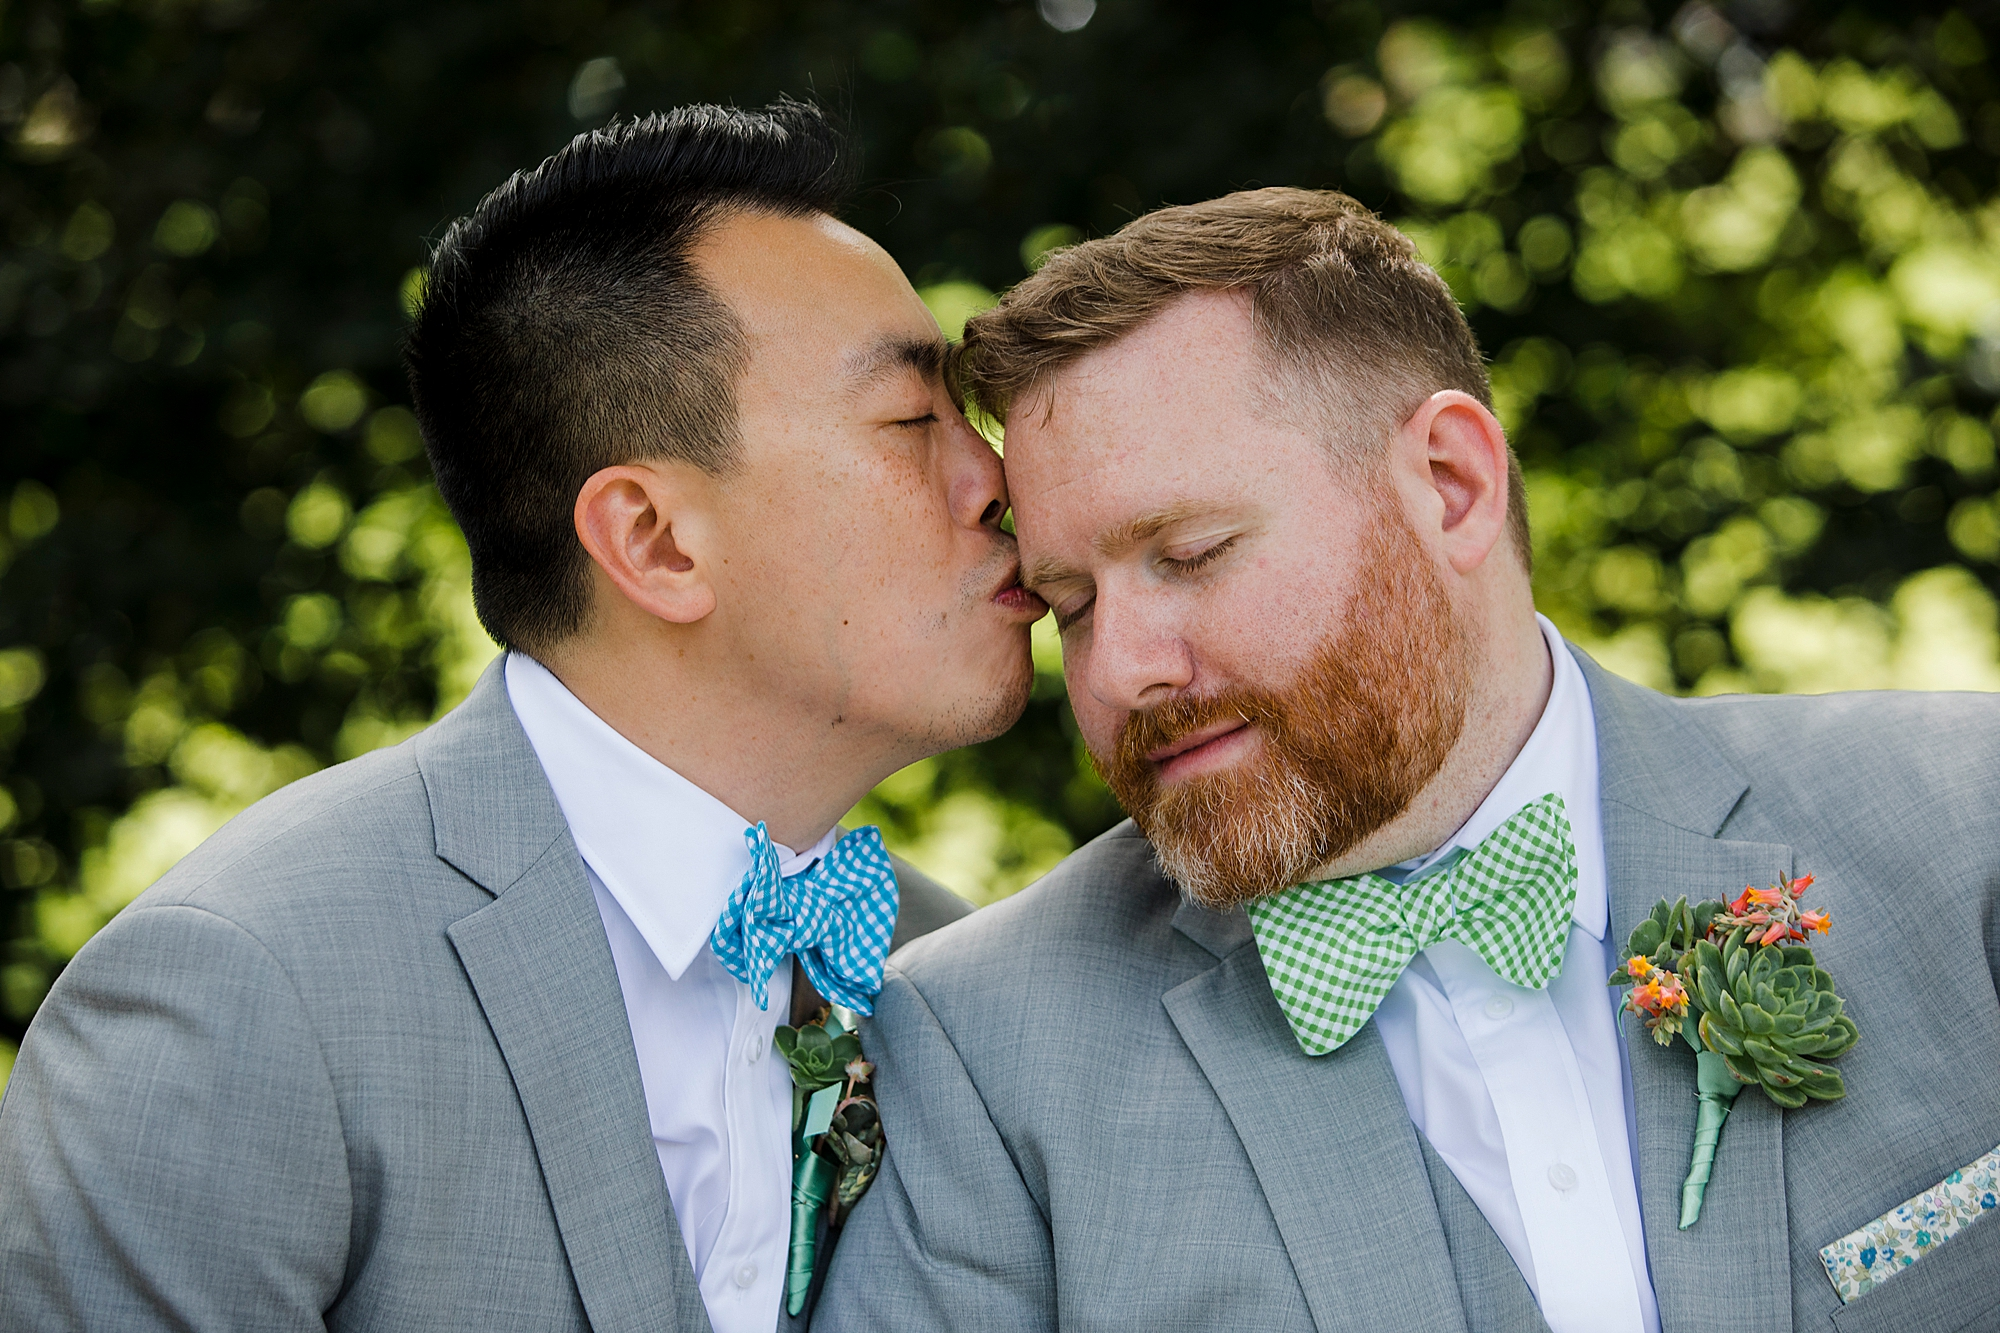 Dan_and_Byron_Love_by_Joe_Mac_Philadelphia_Wedding_LGBTQ_Photography_Gay_Independence_visitor_Center_45.JPG